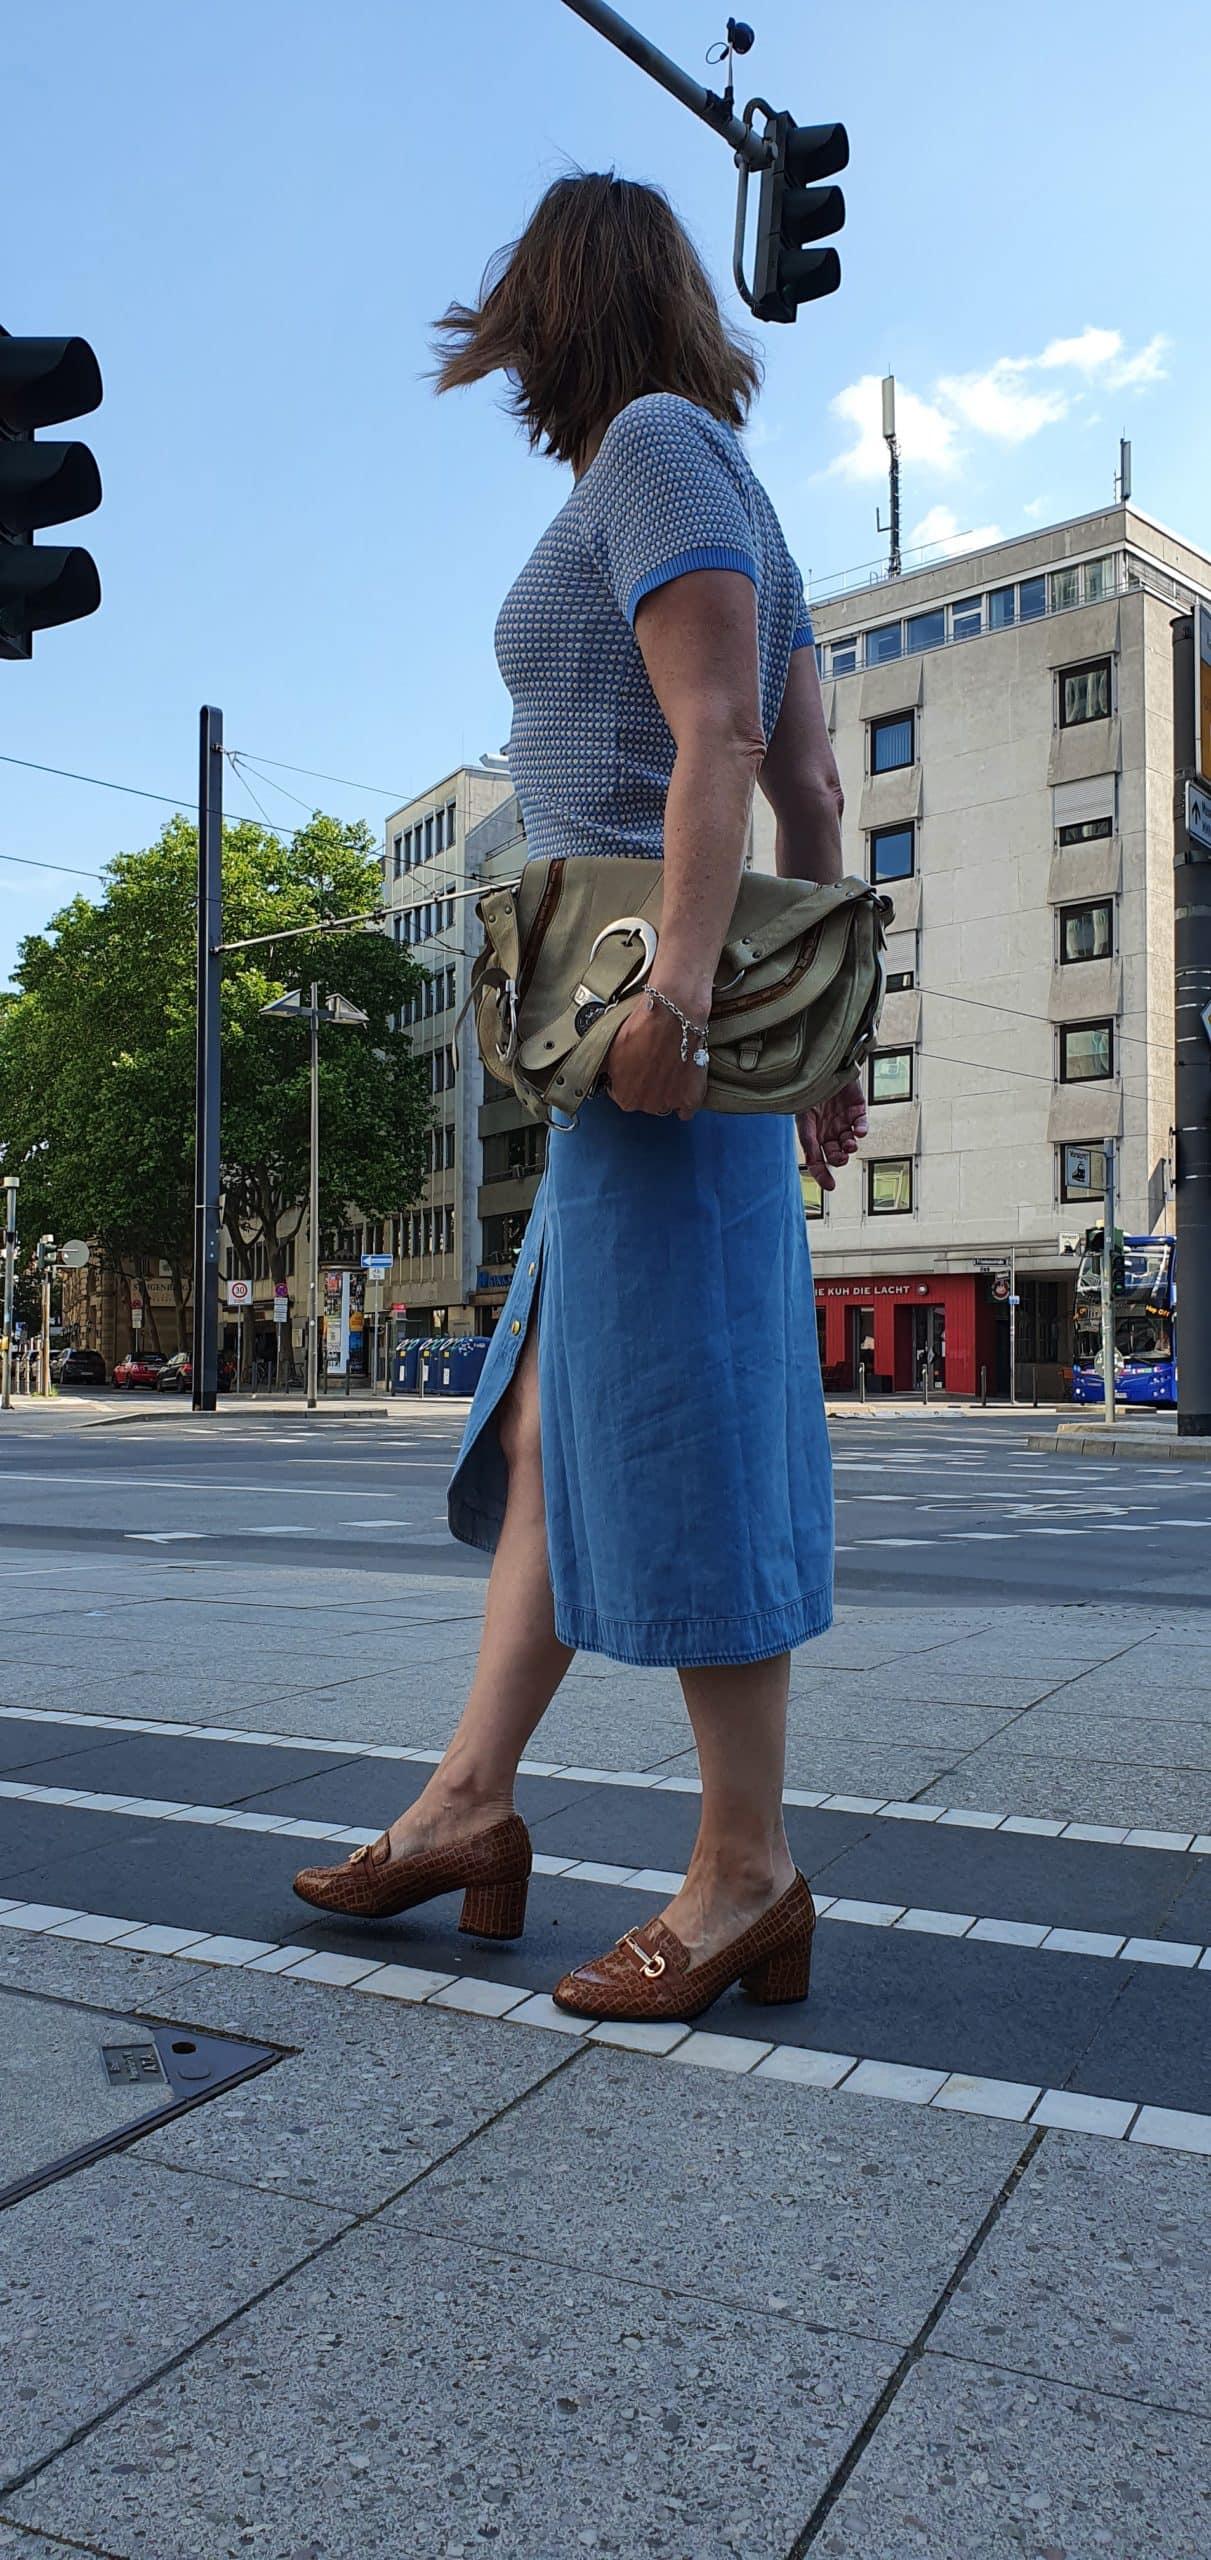 Jeans-rock-passt-zu-figur_denim-trend-oceanblue-style.jpg